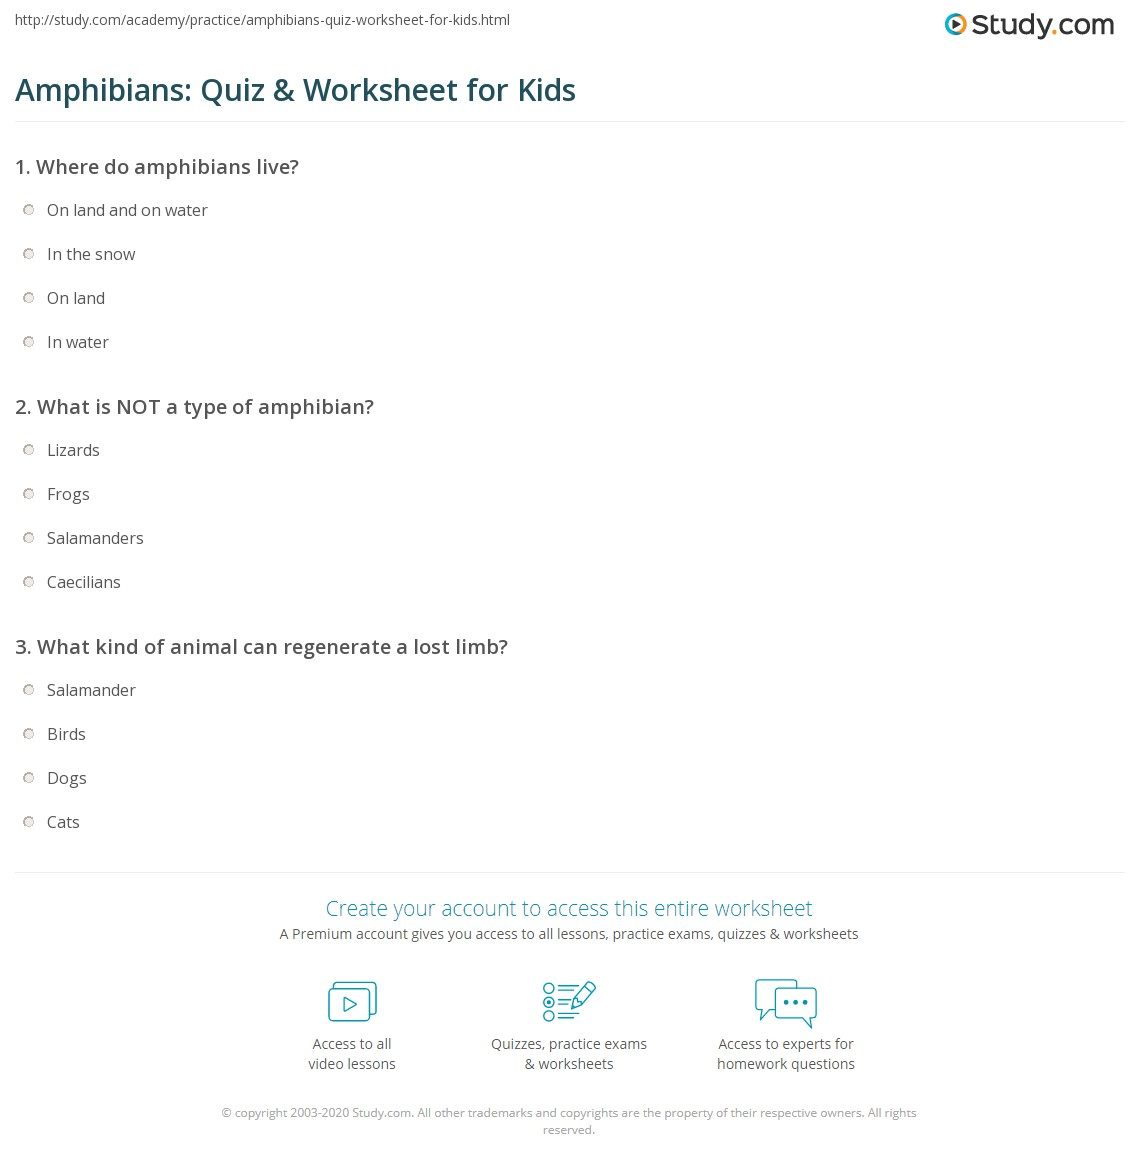 Amphibians Quiz Amp Worksheet For Kids